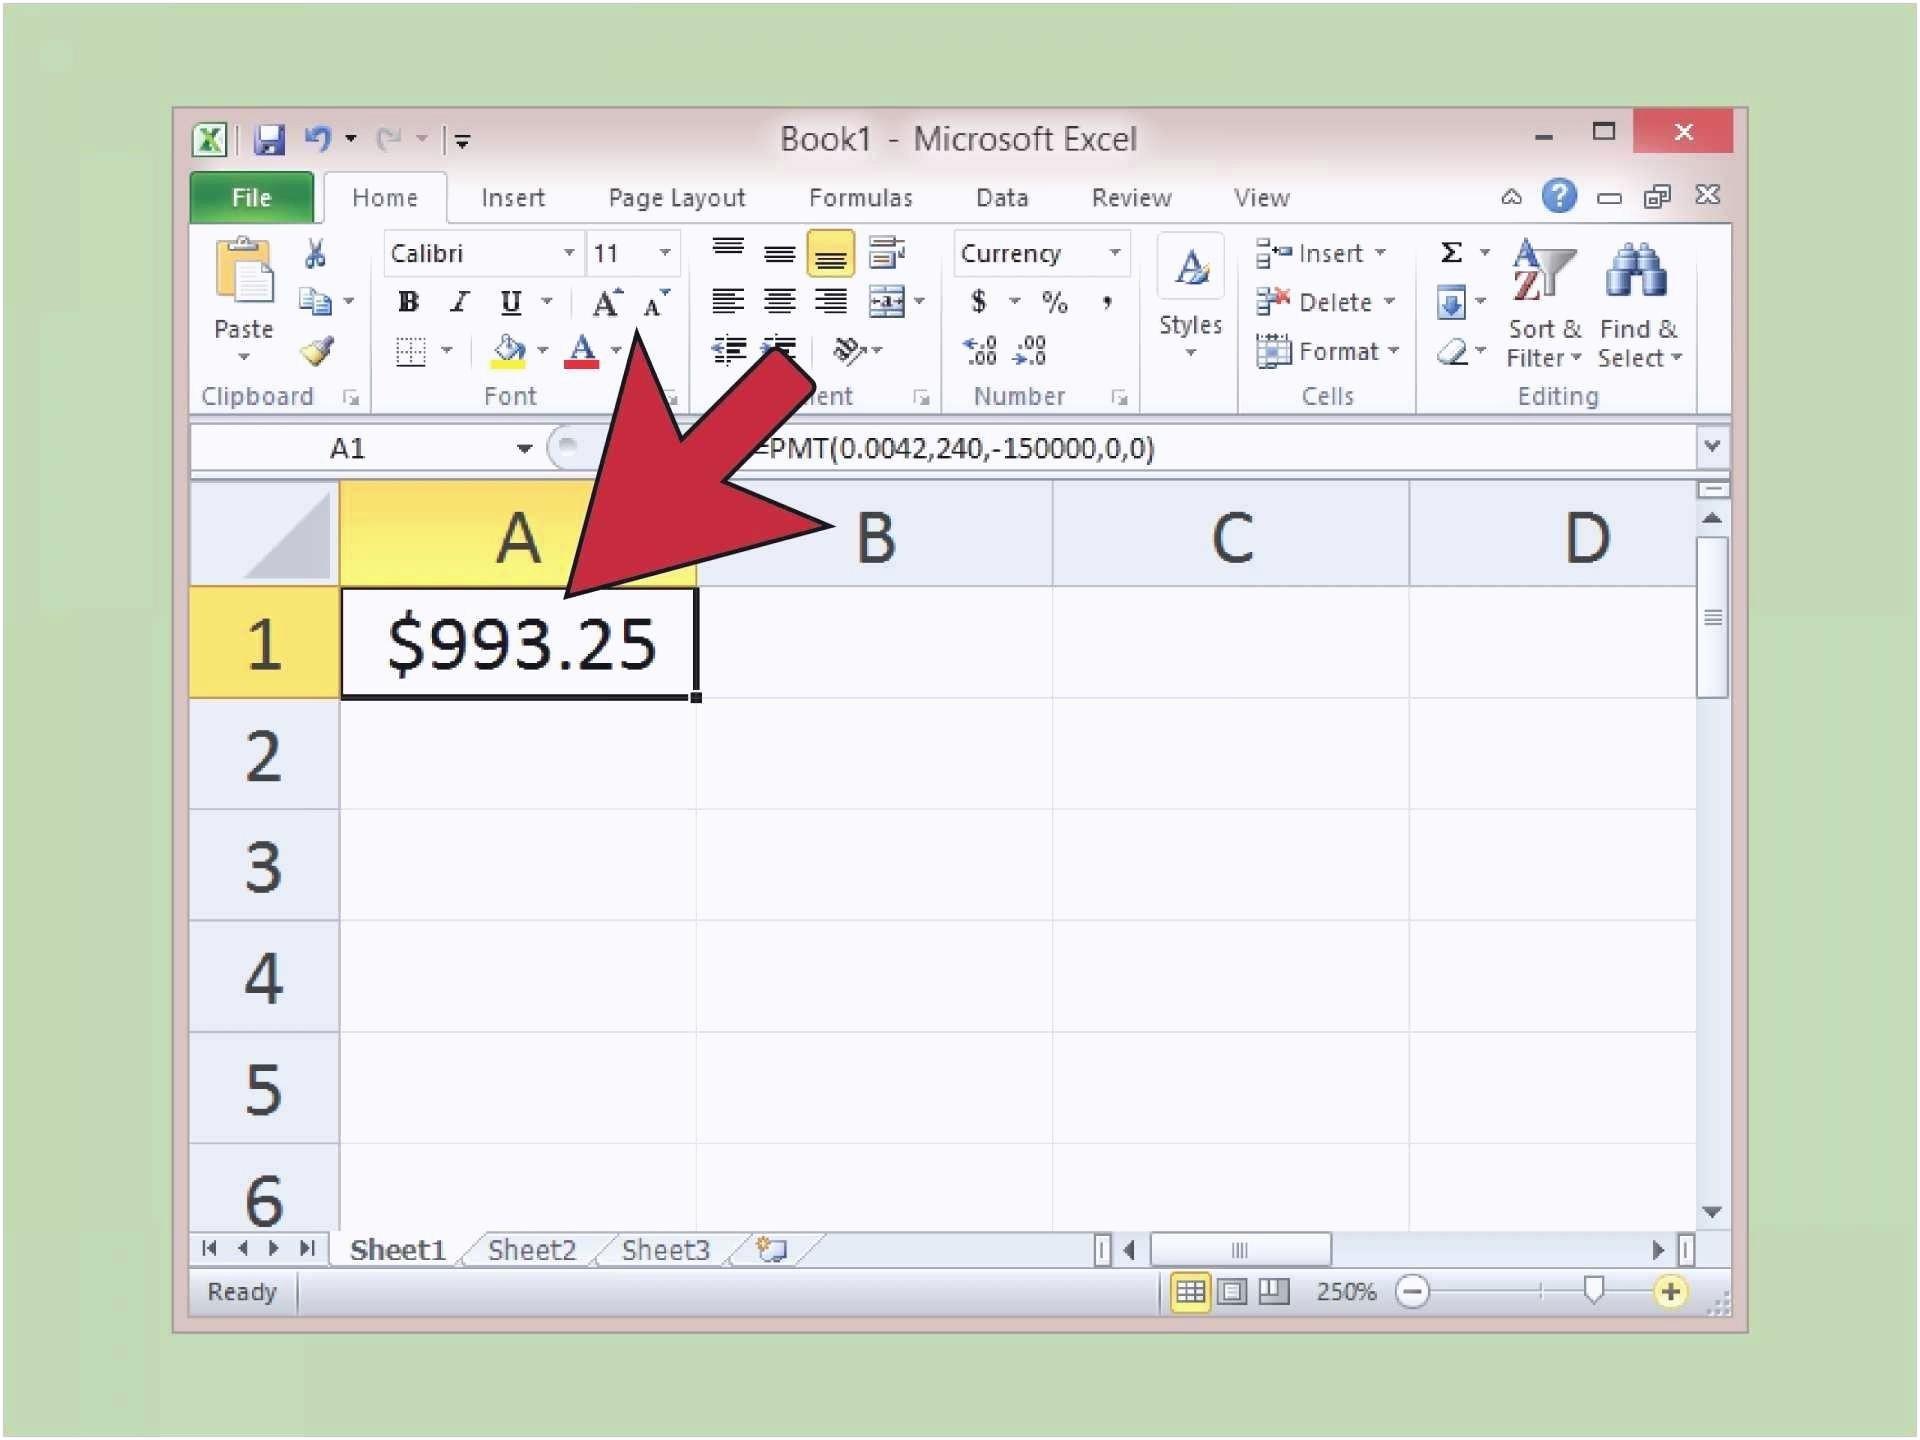 Excel Kalender Vorlage Sammlungen Excel Kalender Vorlage